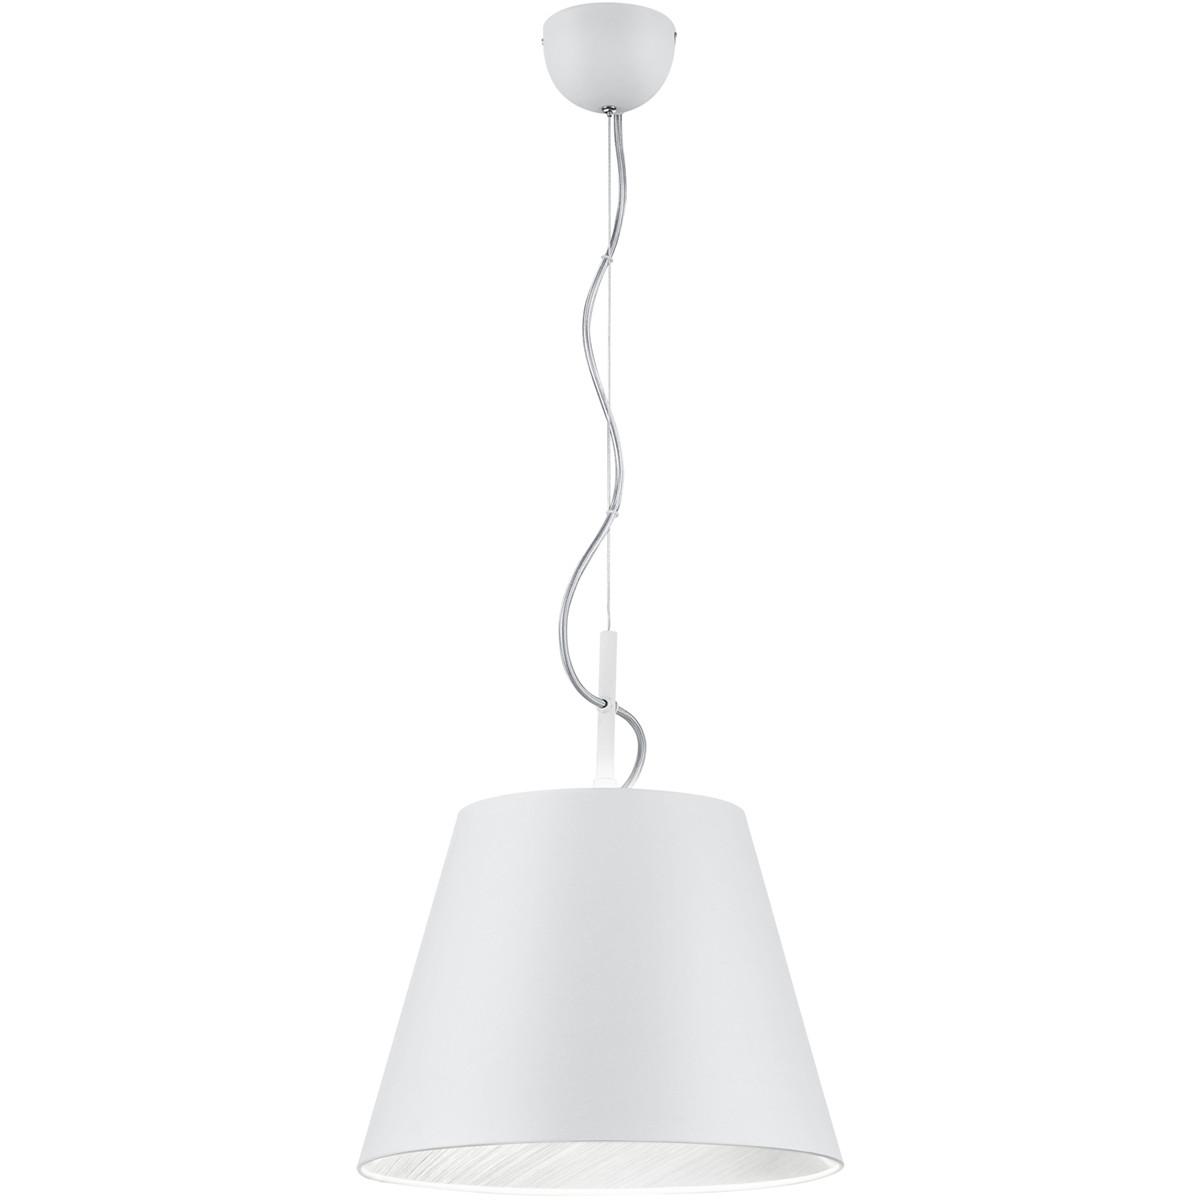 LED Hanglamp - Trion Andra - E27 Fitting - Rond - Mat Wit - Aluminium